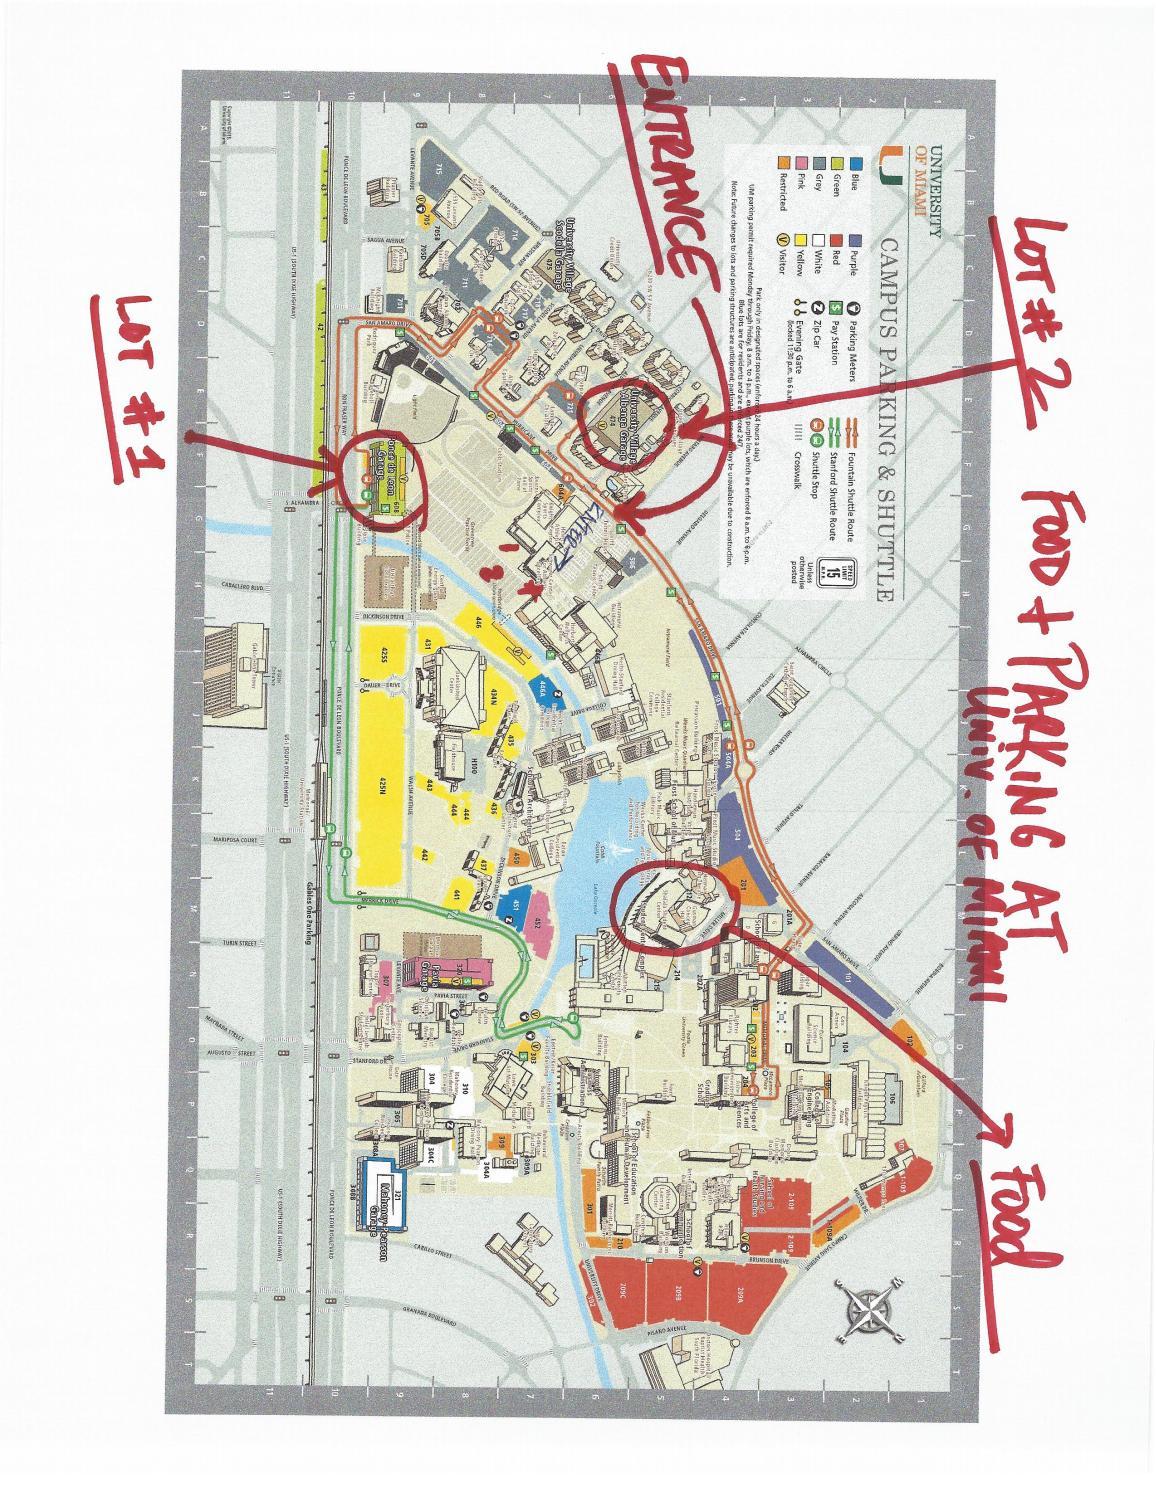 parking map at university of miamib. green media